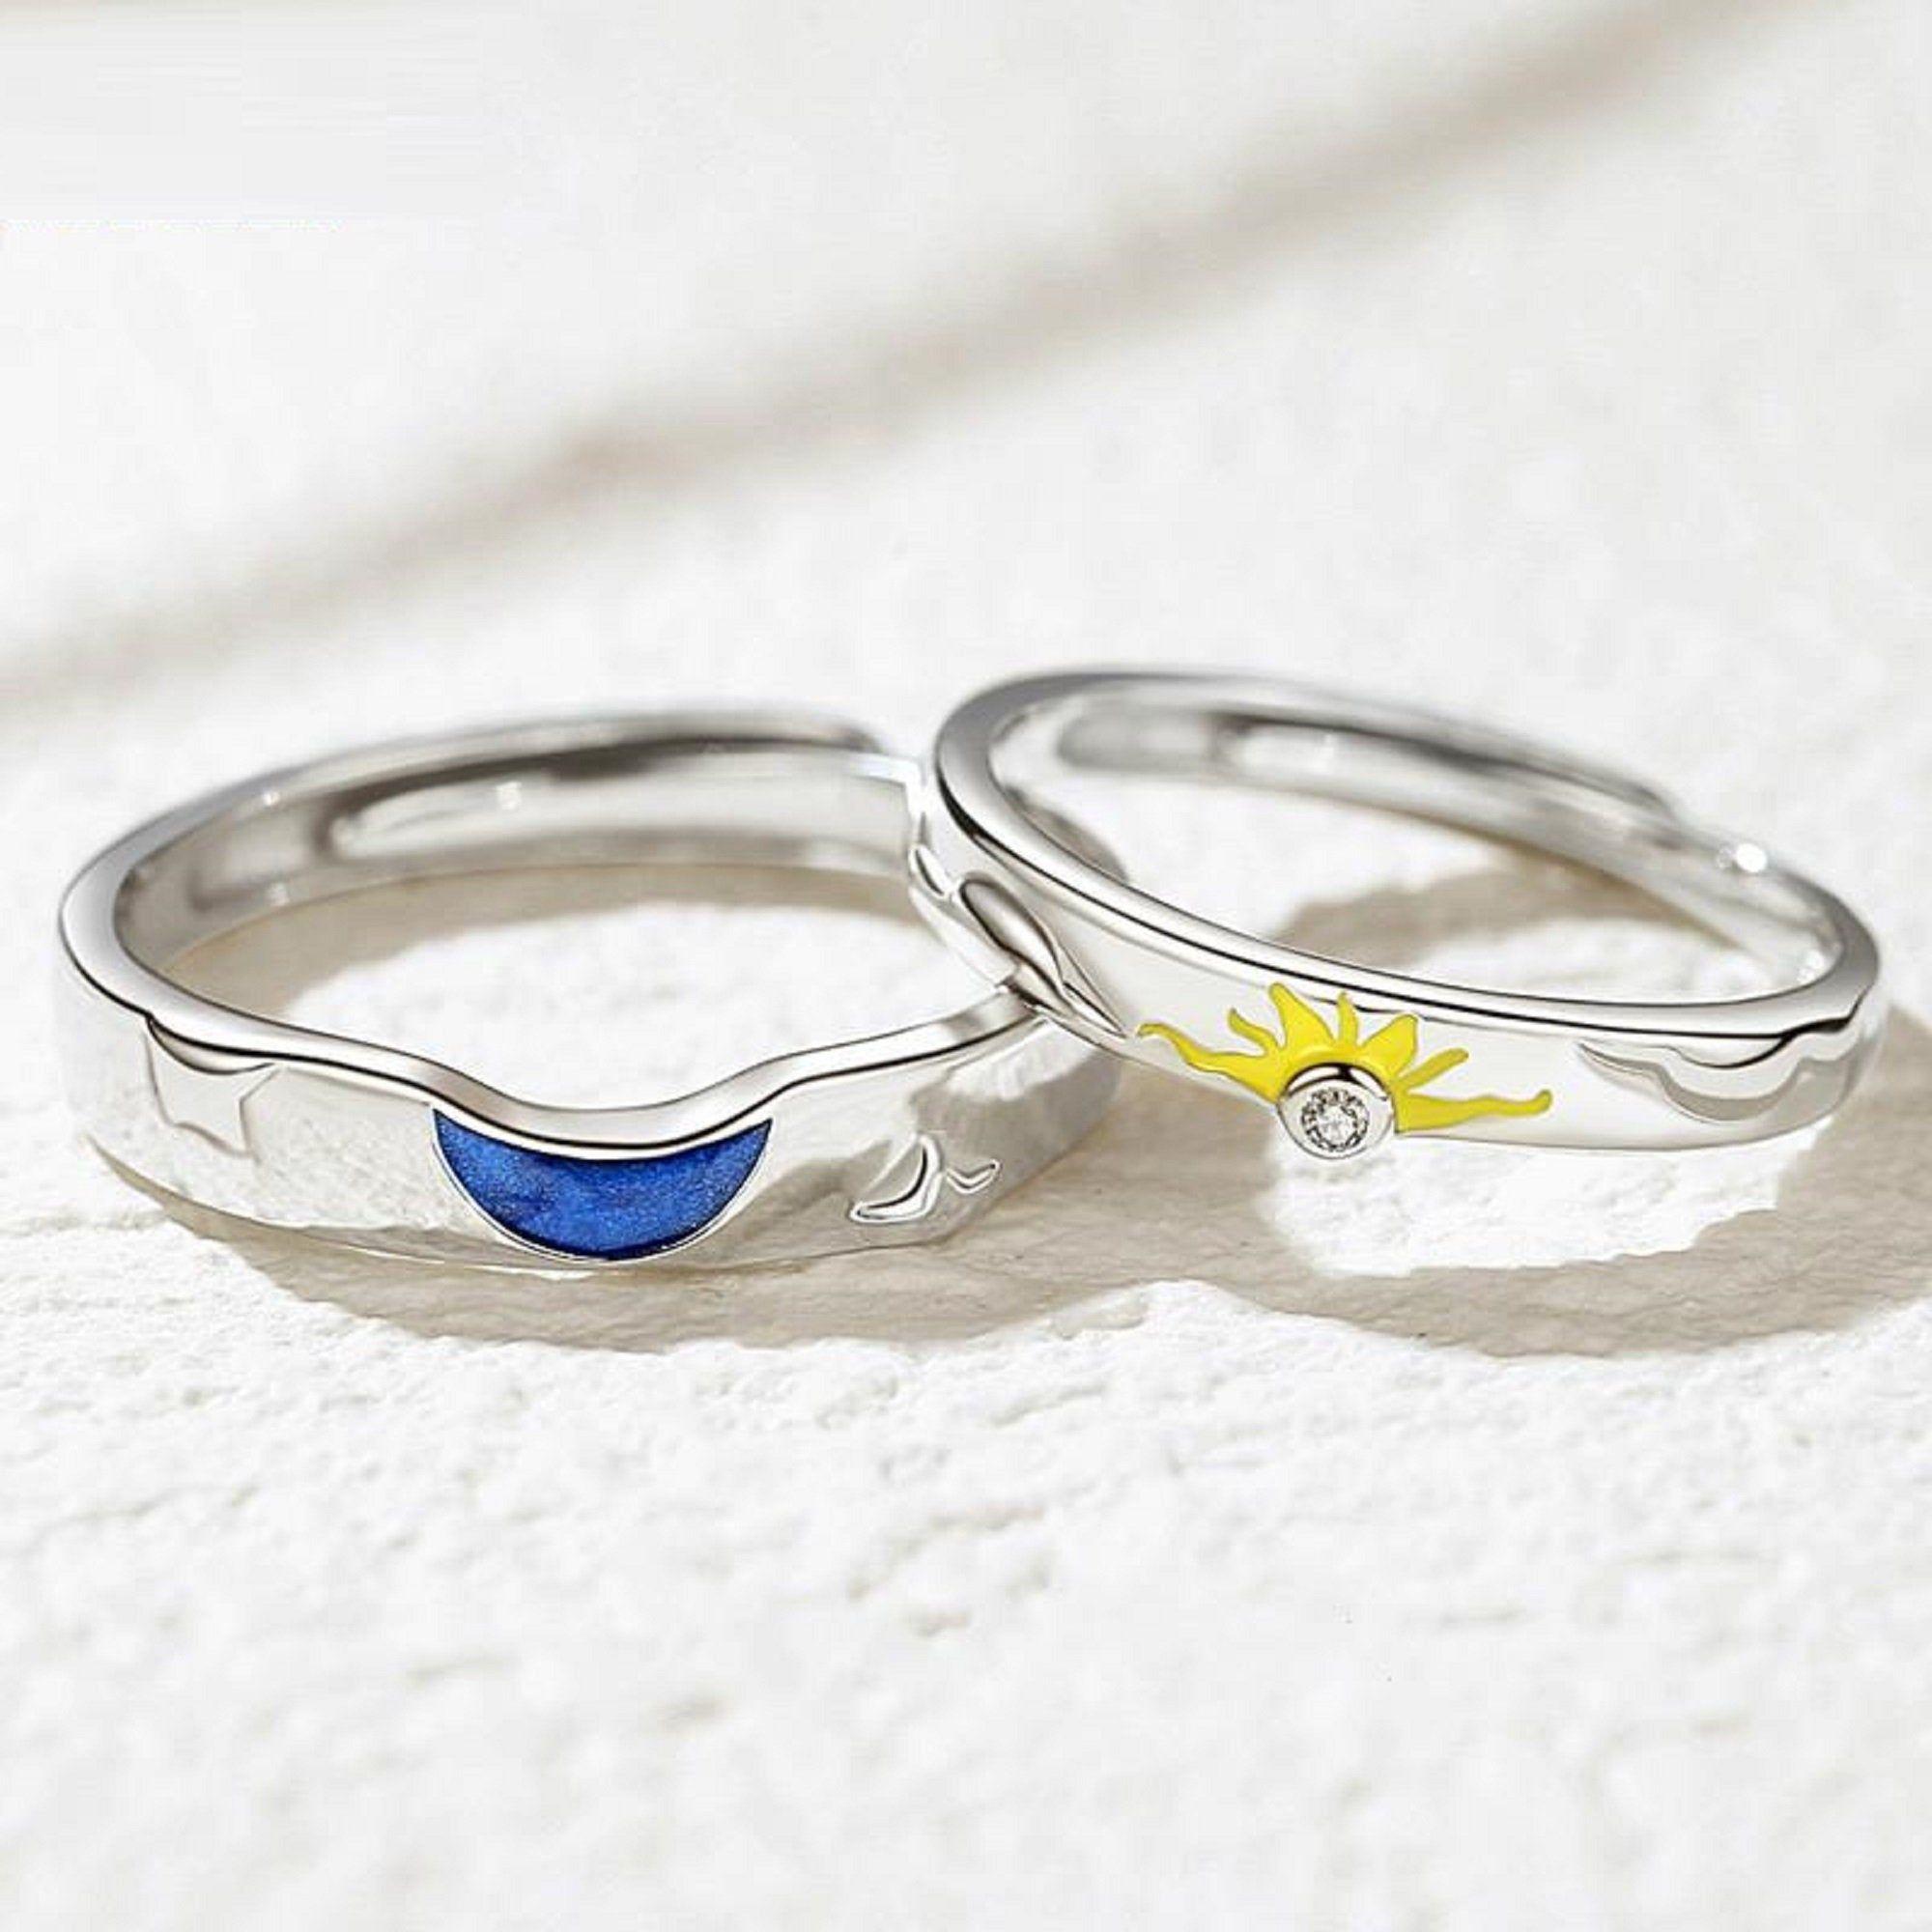 S925 Sterling Silver Zircon Sun Moon Promise Rings Couple Etsy Promise Rings For Couples Couples Ring Set Handmade Engagement Rings